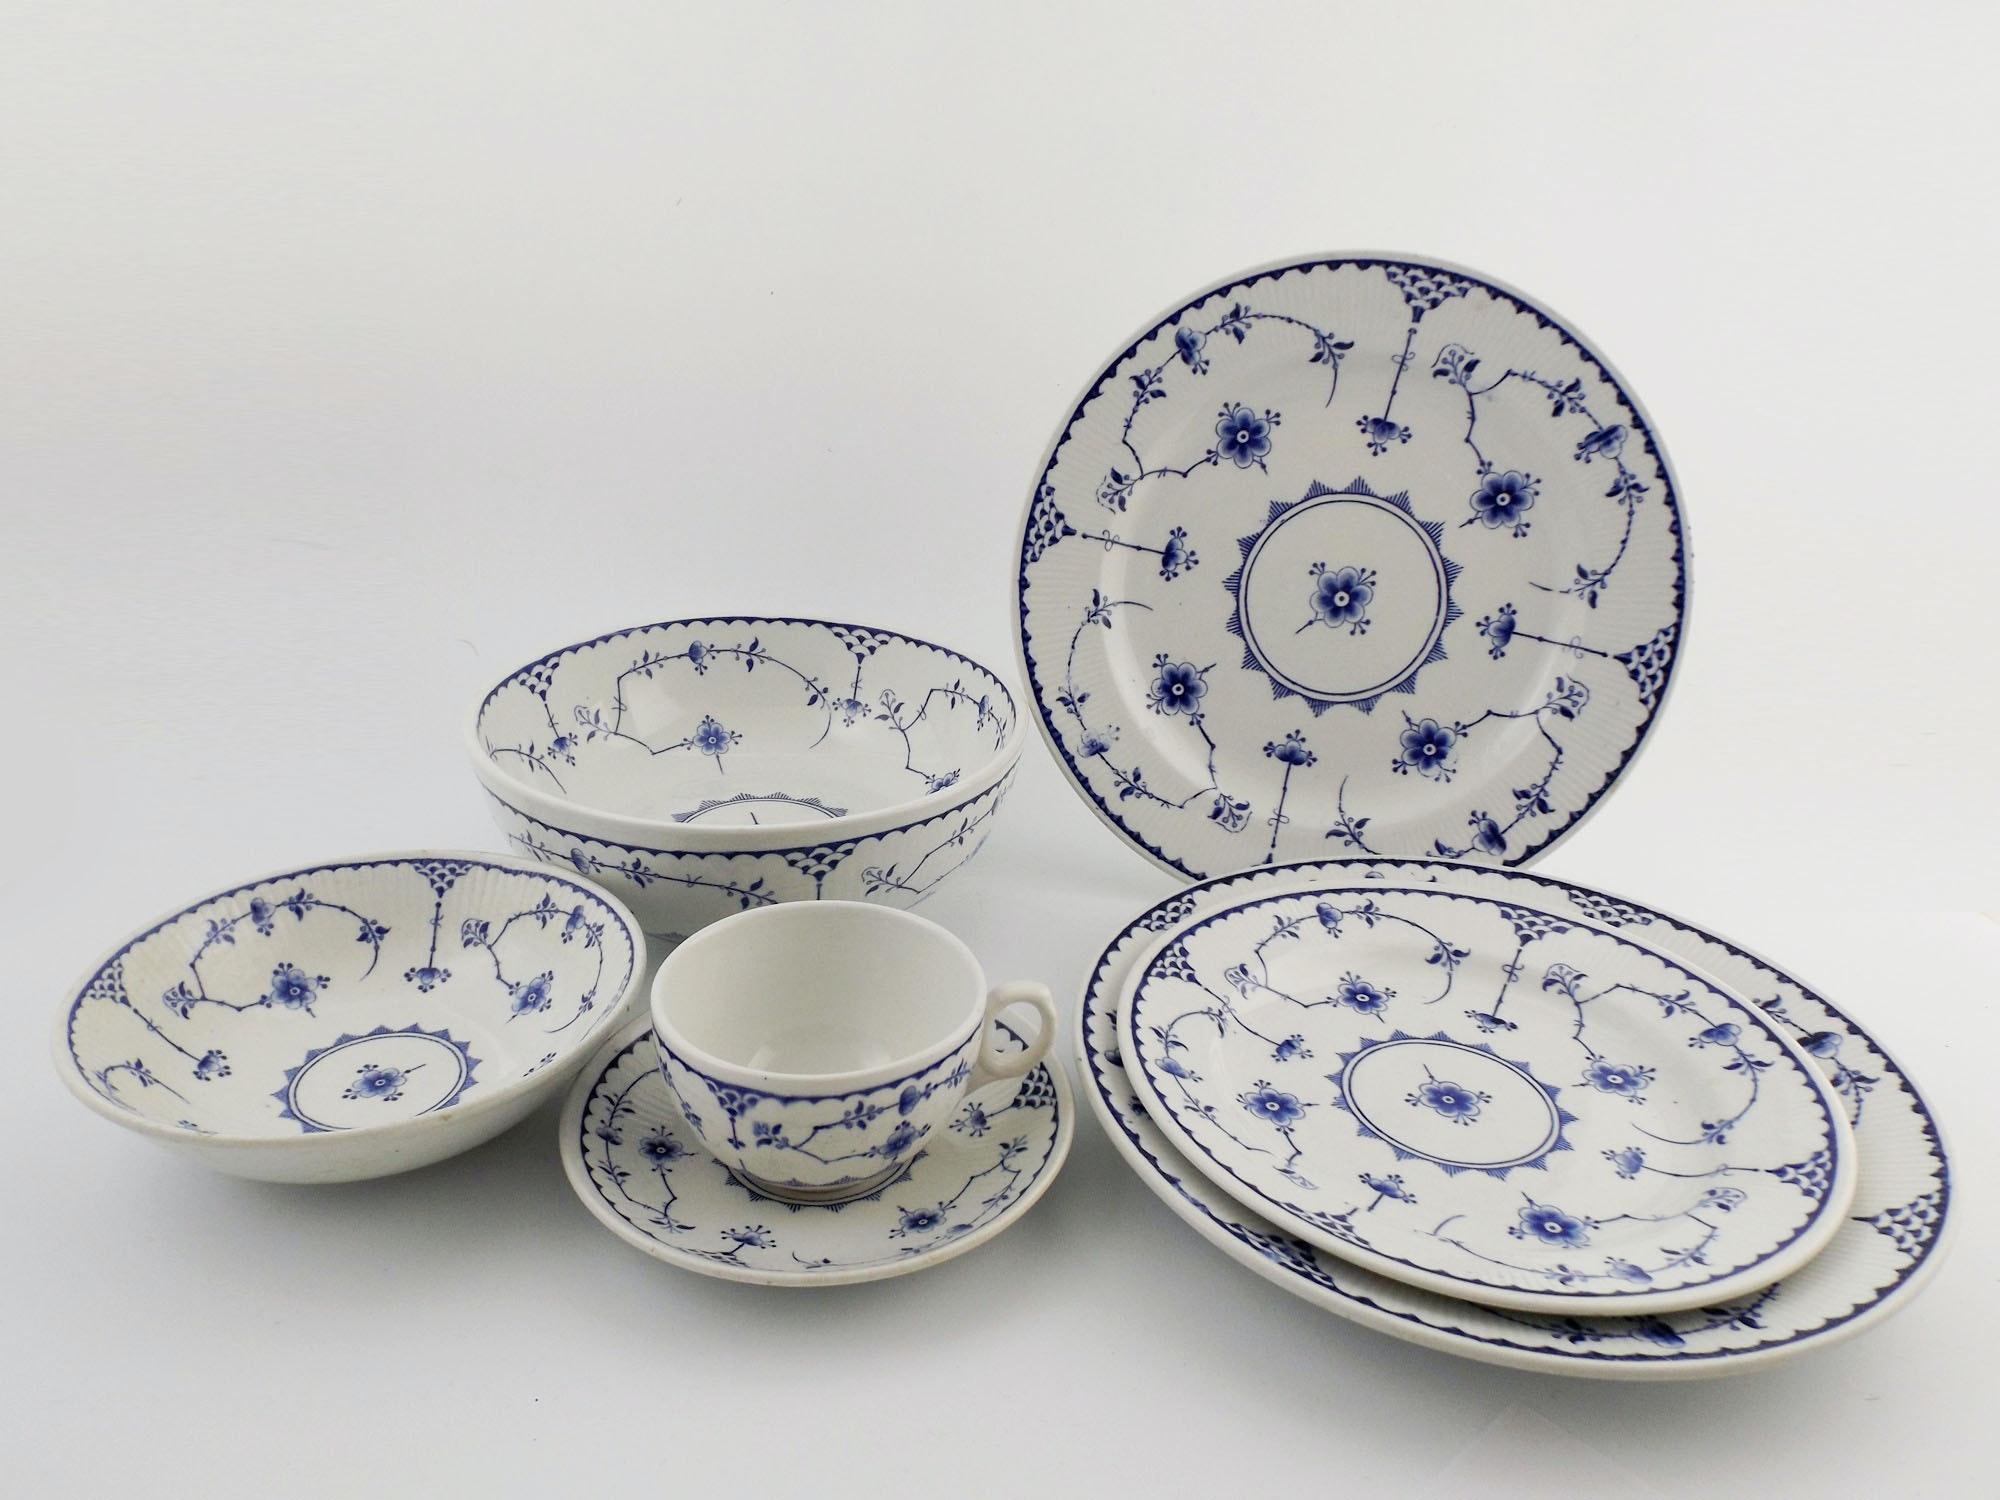 Set of Furnivals u0027Denmarku0027 China Dinnerware ... & Set of Furnivals u0027Denmarku0027 China Dinnerware : EBTH